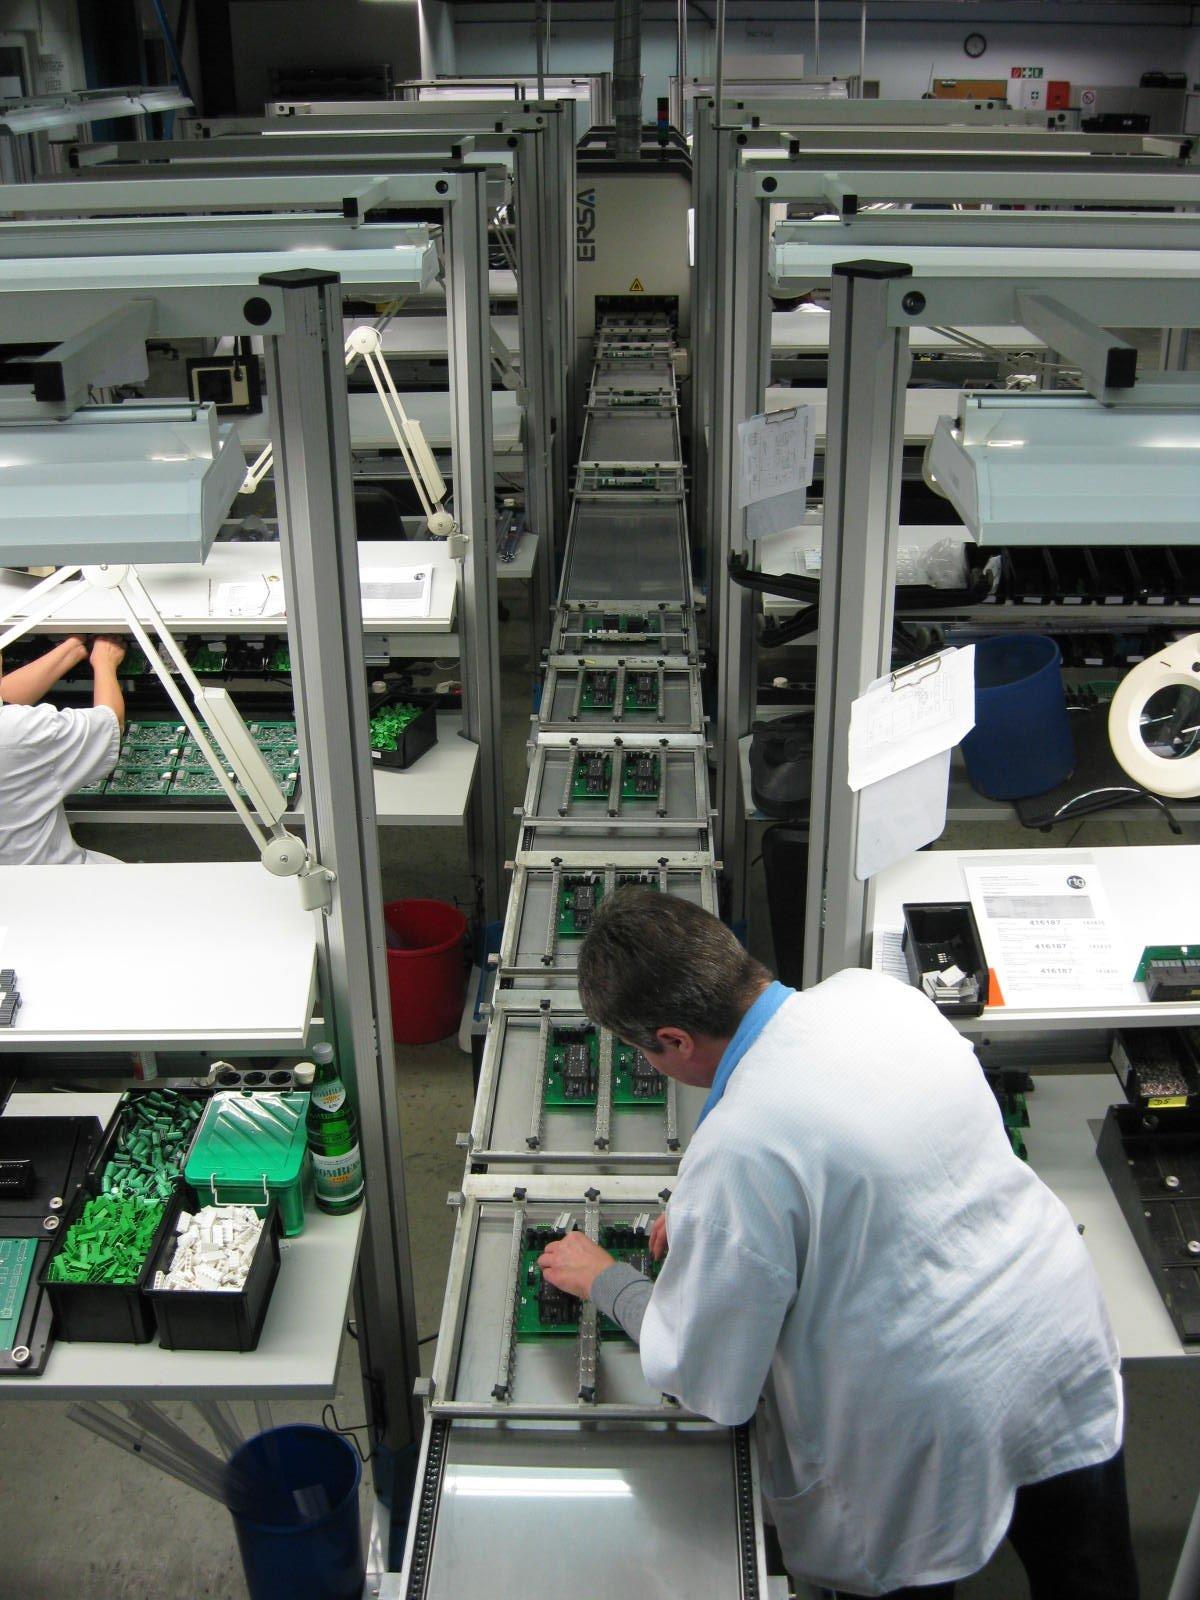 Herstellung der Erdbebensensoren beisecty electronics in Castrop-Rauxel.